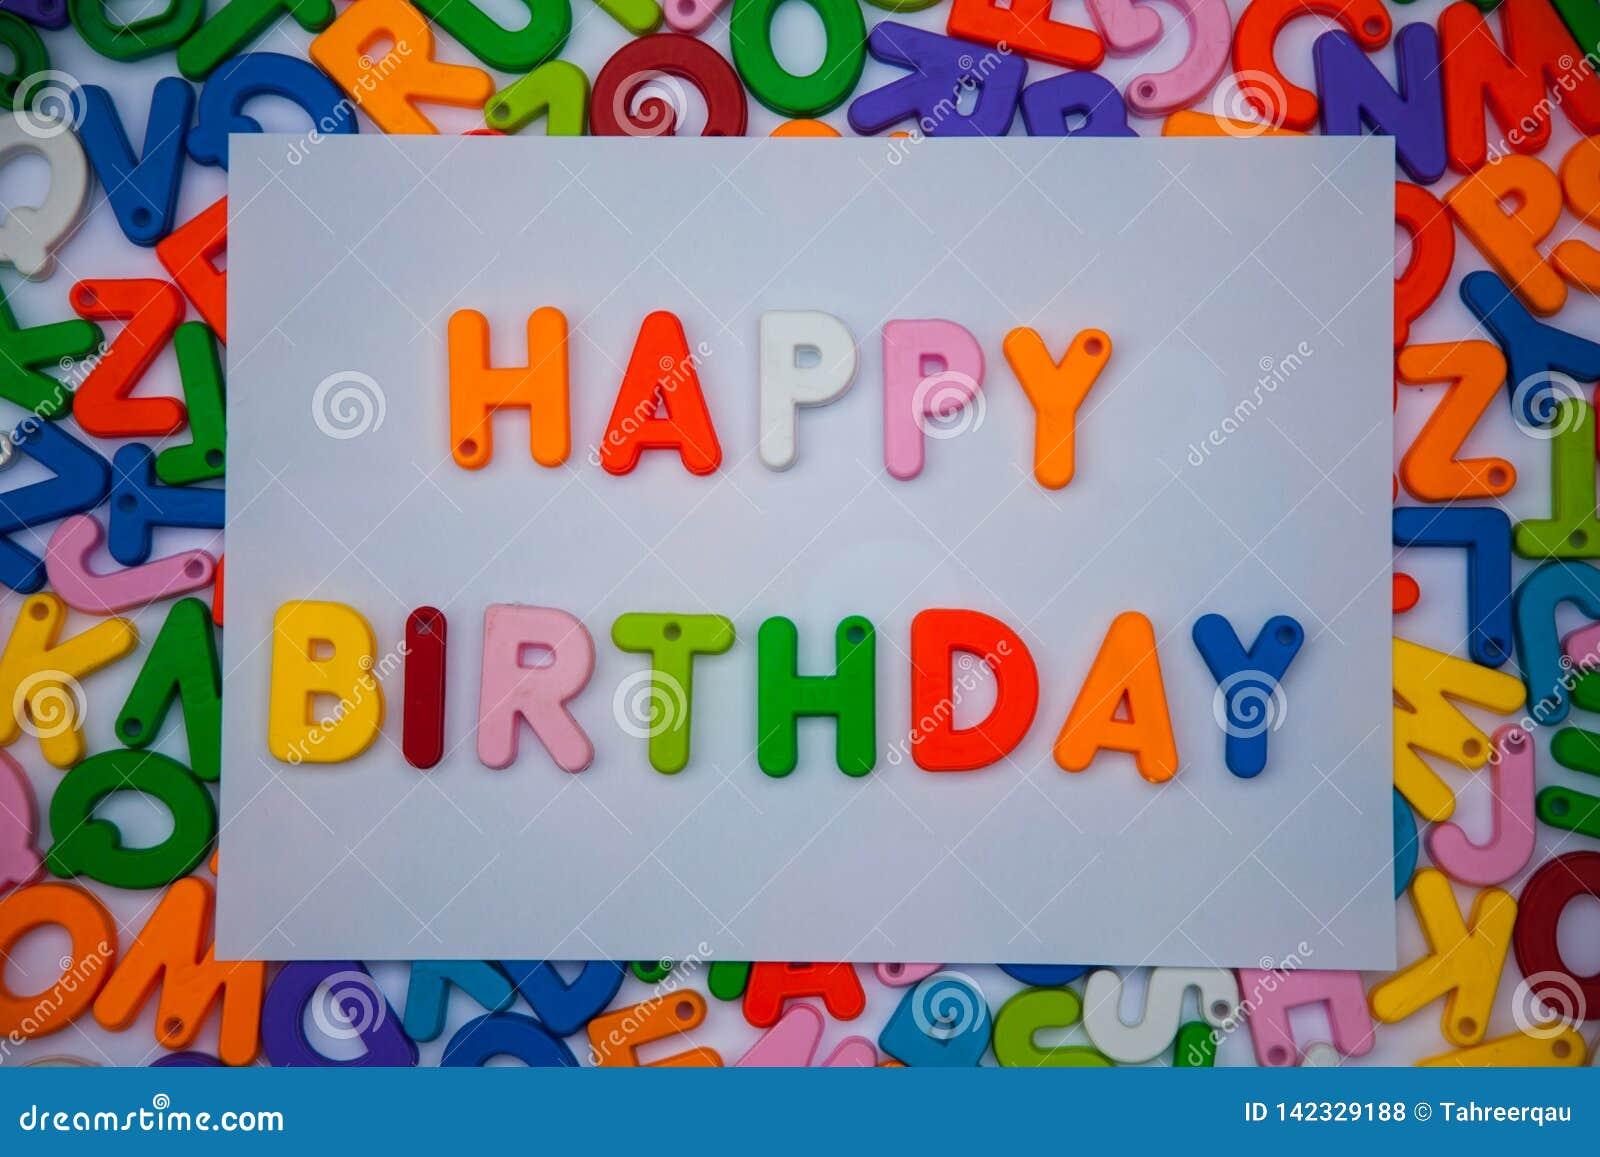 Happy birthday written with alphabet blocks